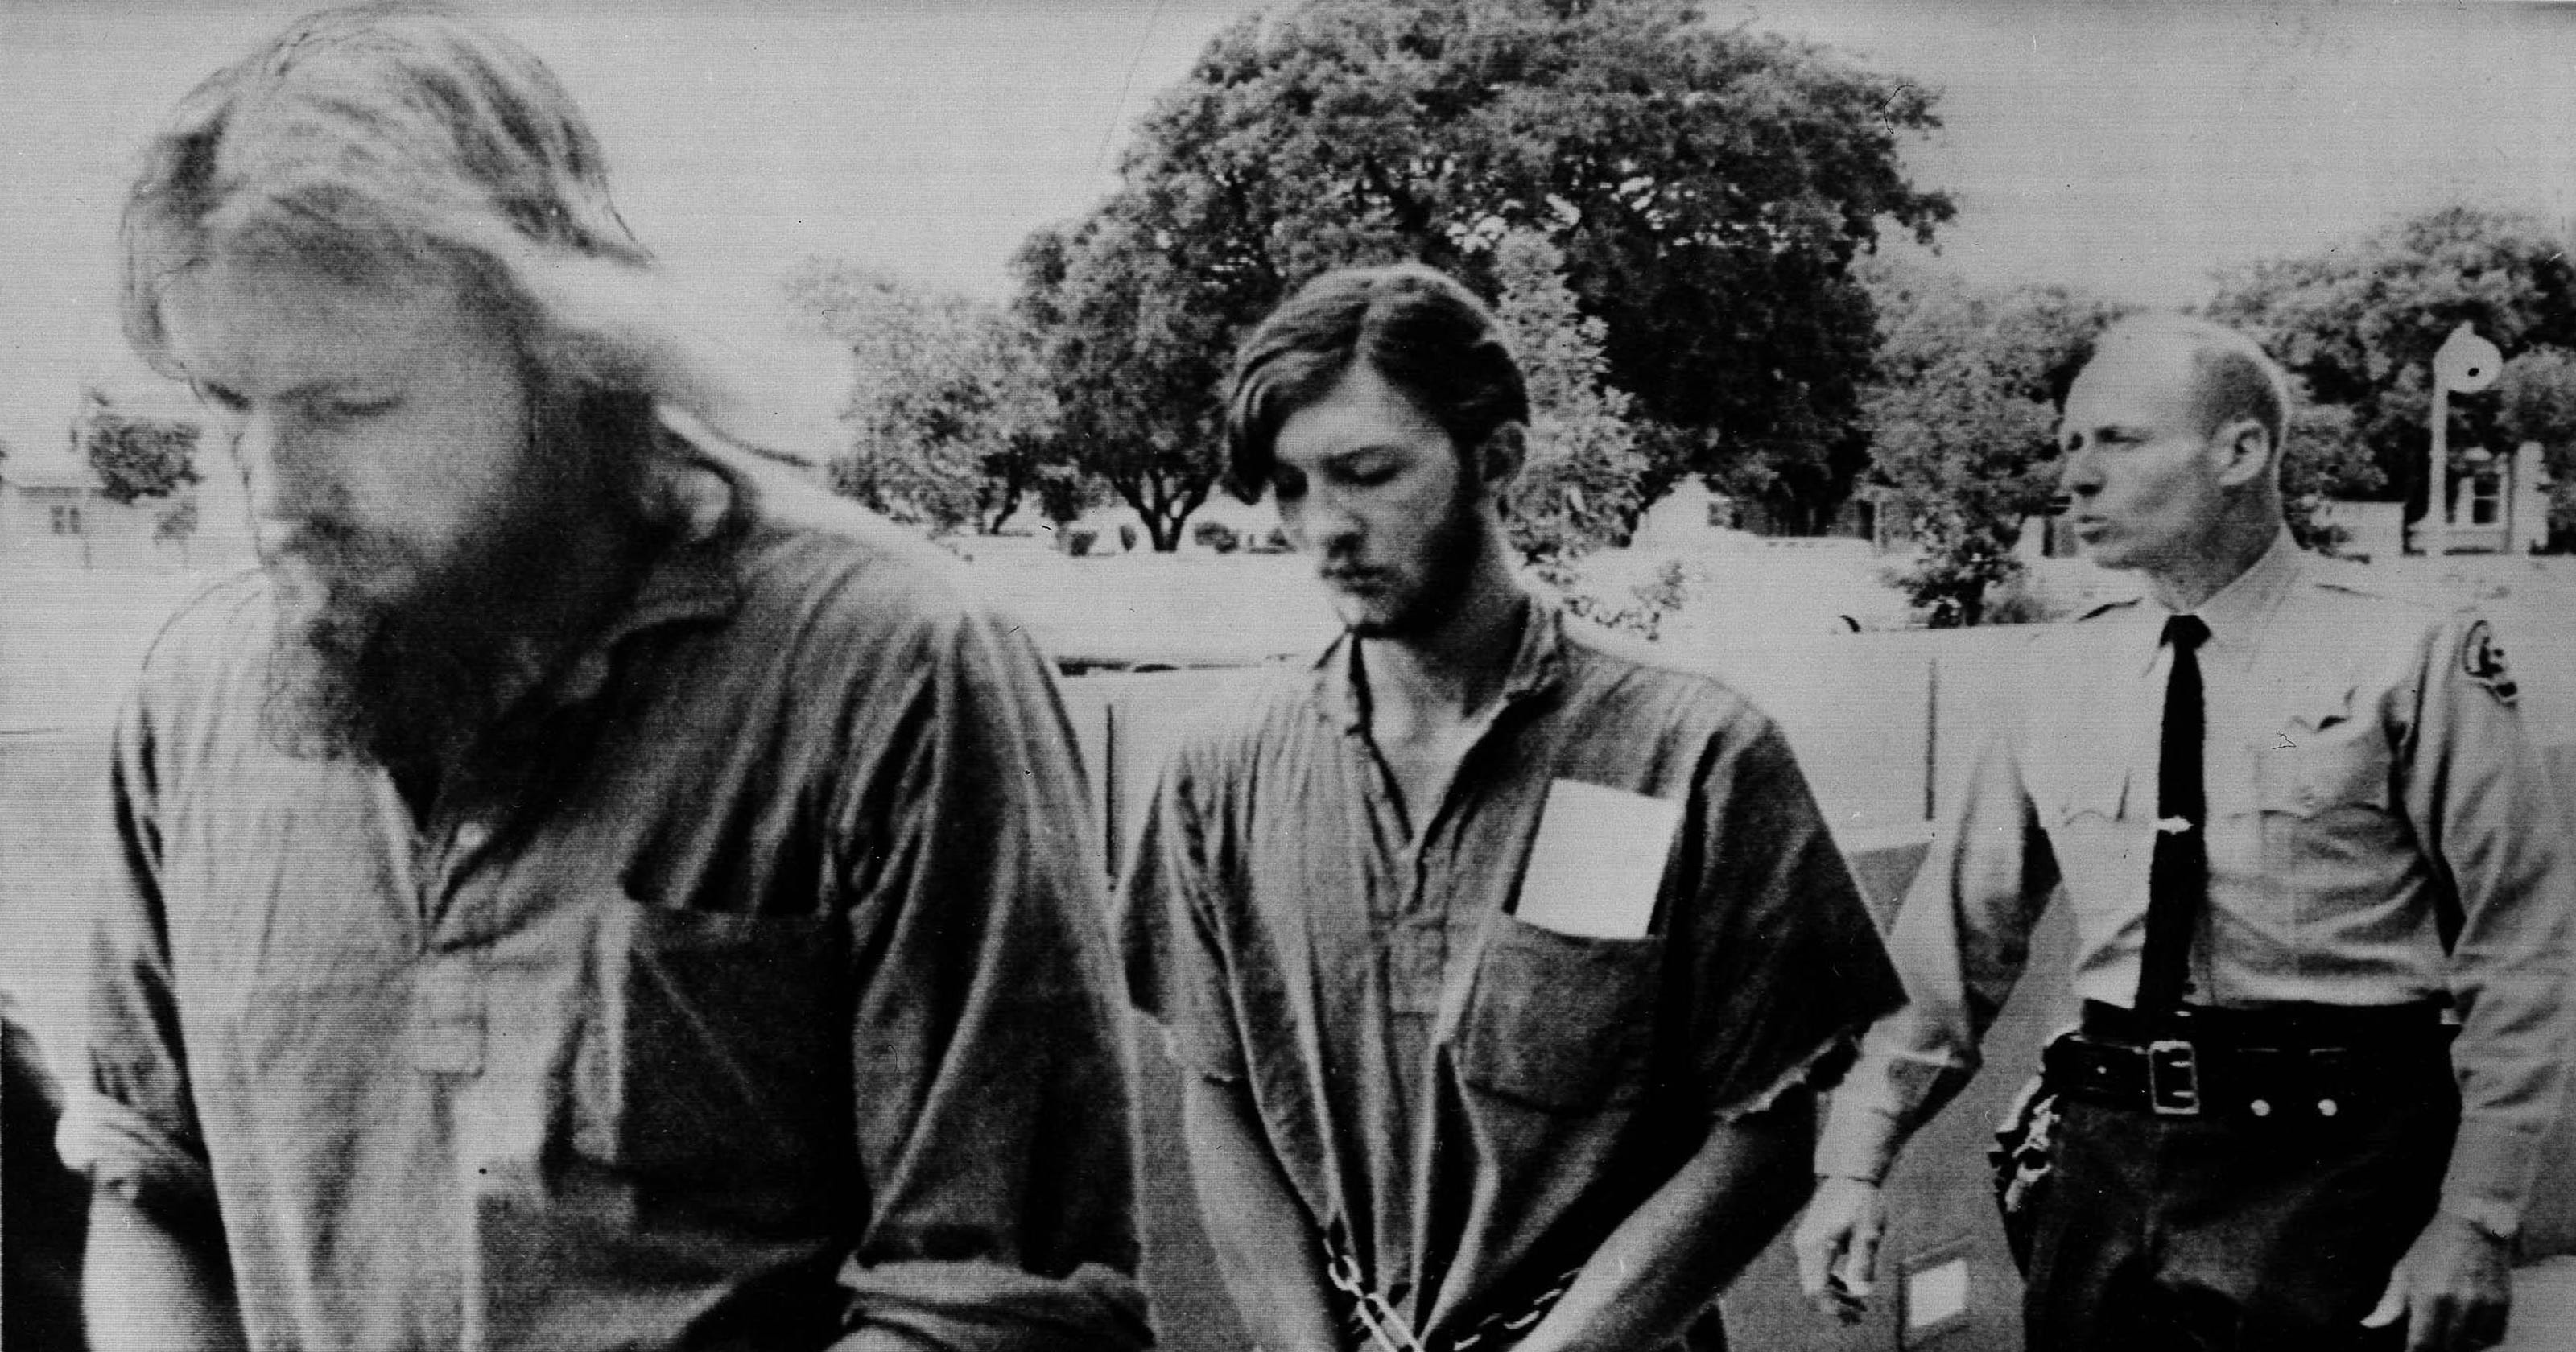 I'm a cannibal': victim's neighbor recalls horrific 1970 murder